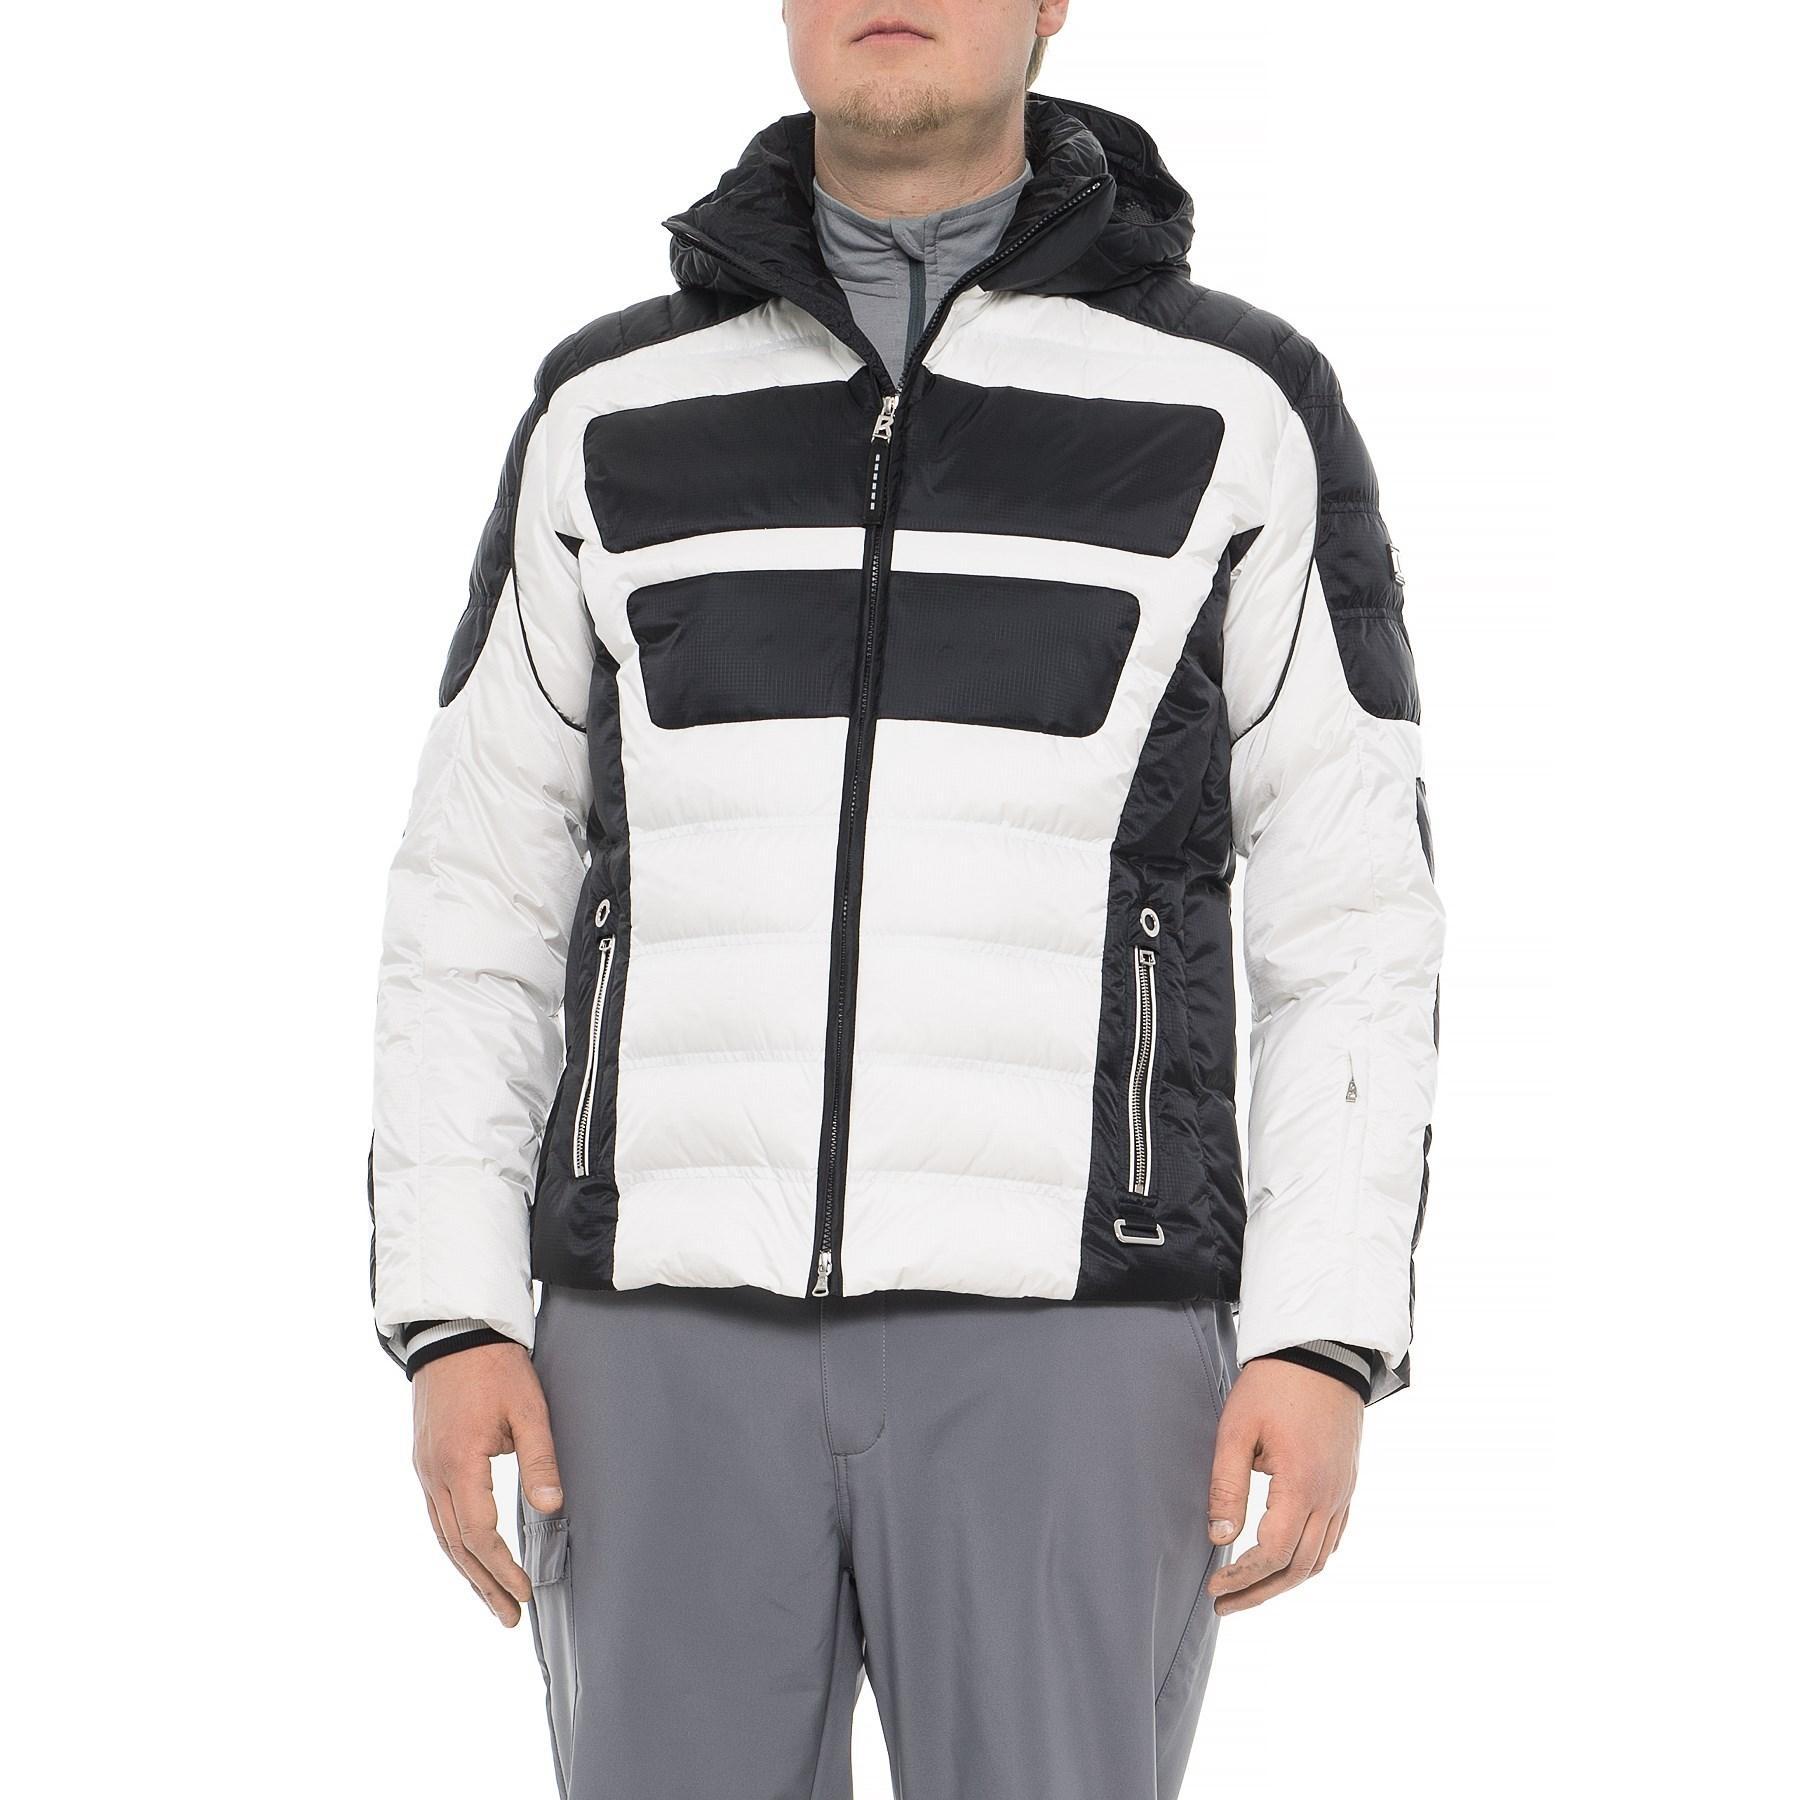 7b5a696dd08 Bogner Enrico-d Down Ski Jacket (for Men) in White for Men - Lyst